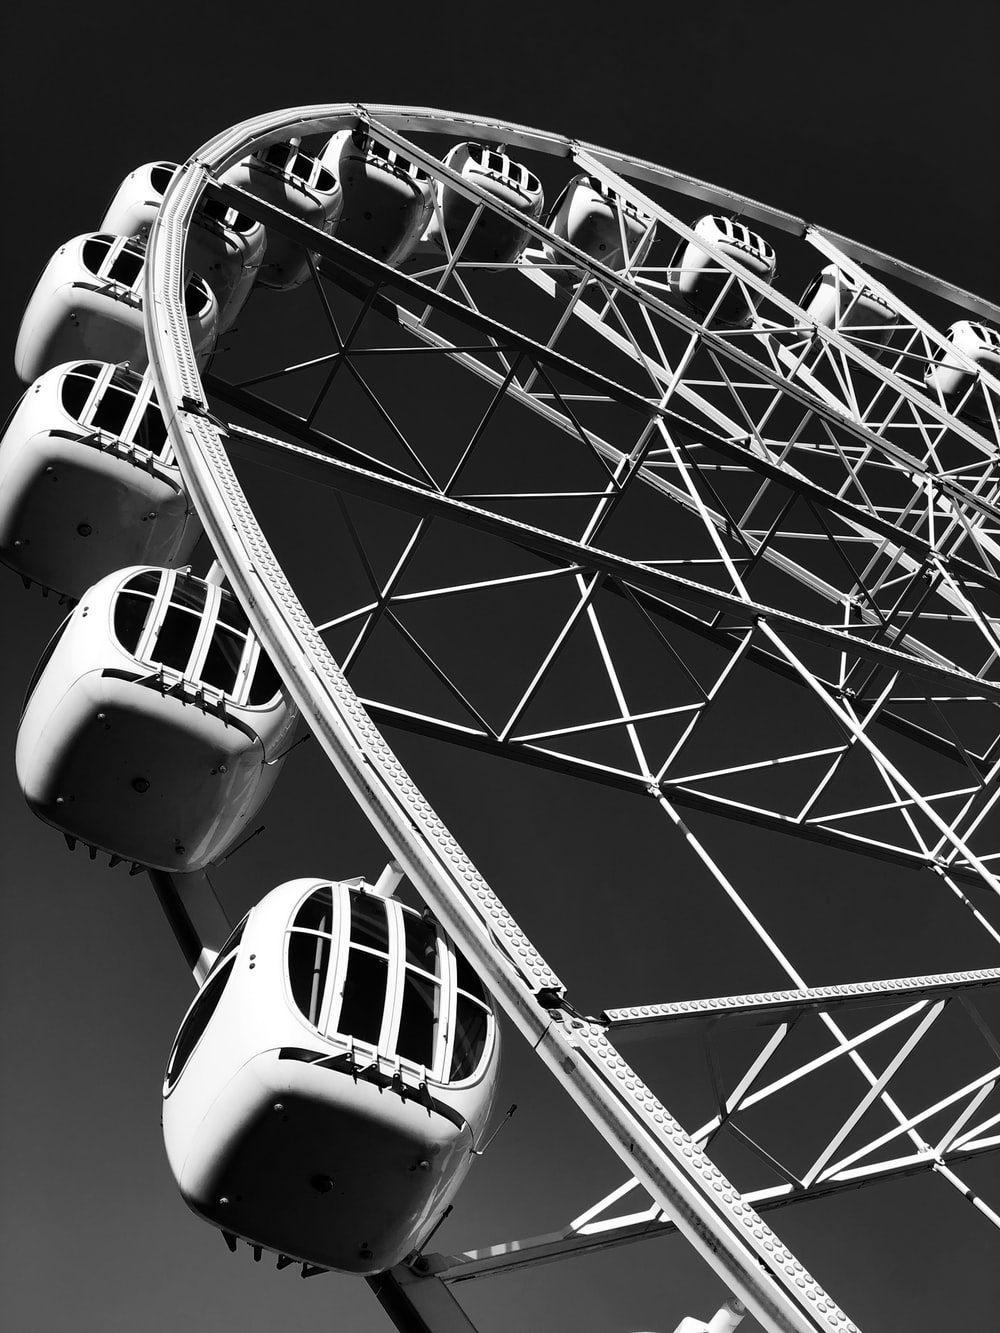 greyscale photography of Ferris Wheel